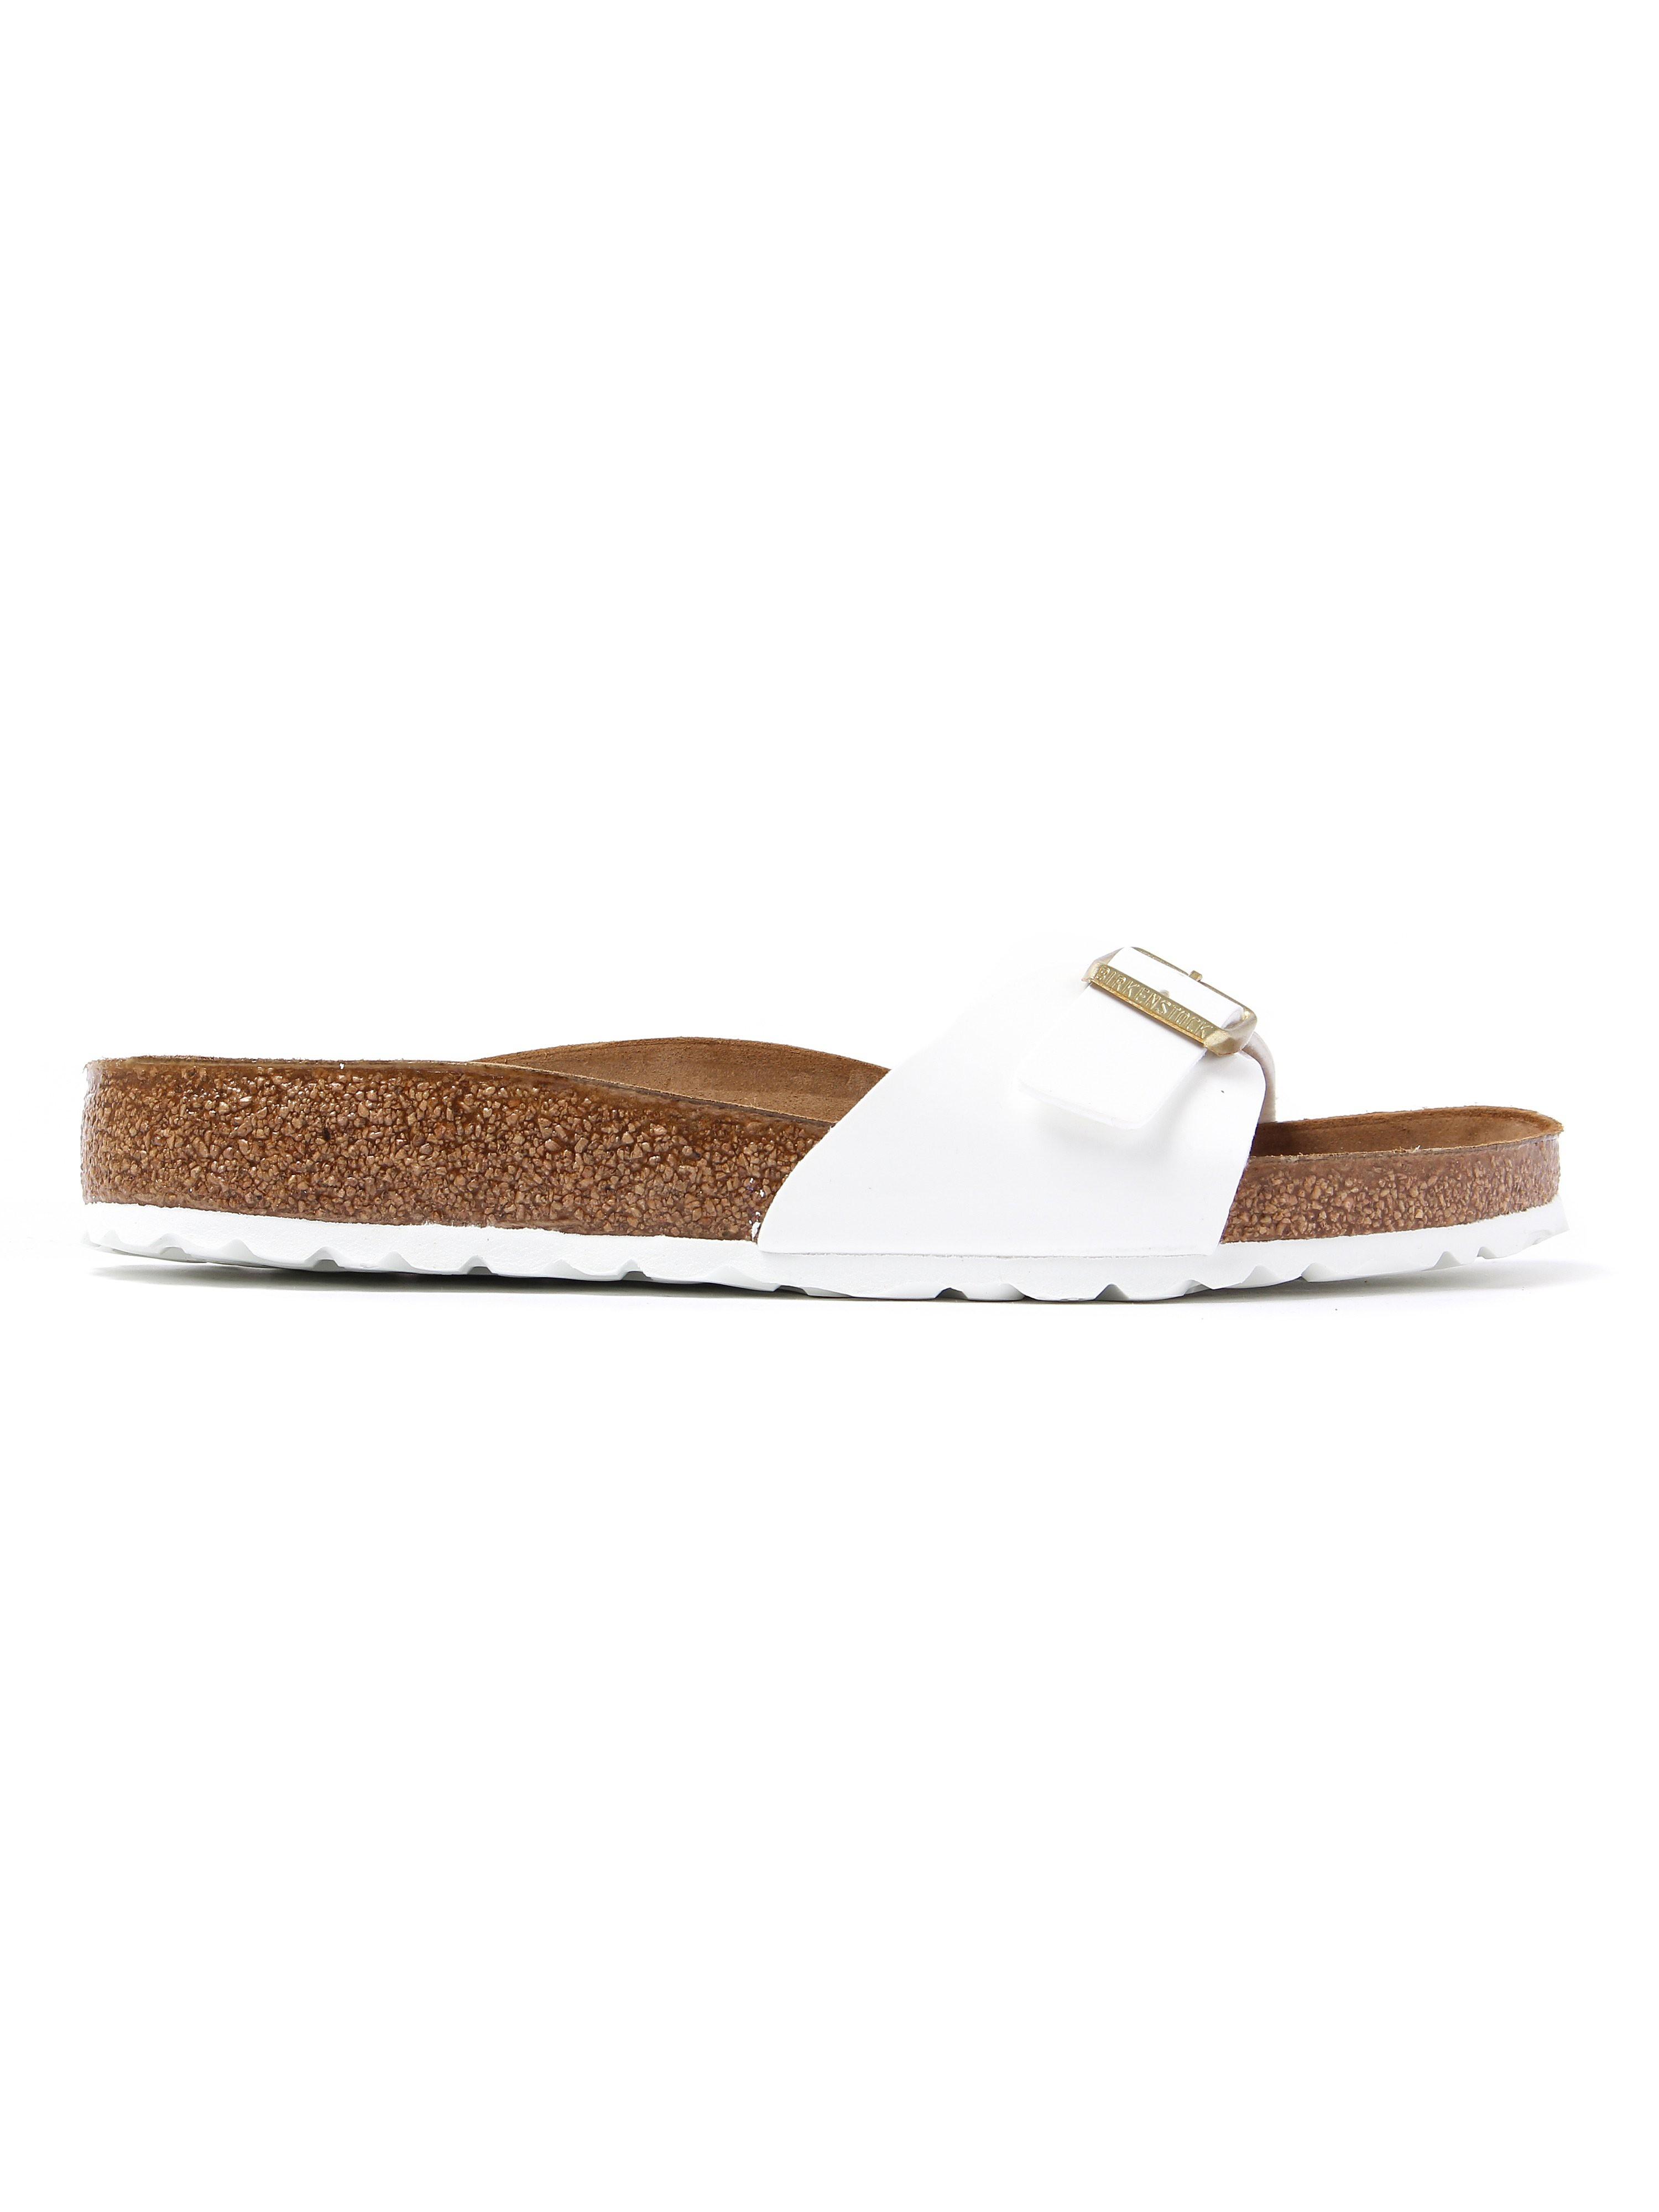 Birkenstock Women's Madrid Regular Fit Sandals - White Patent